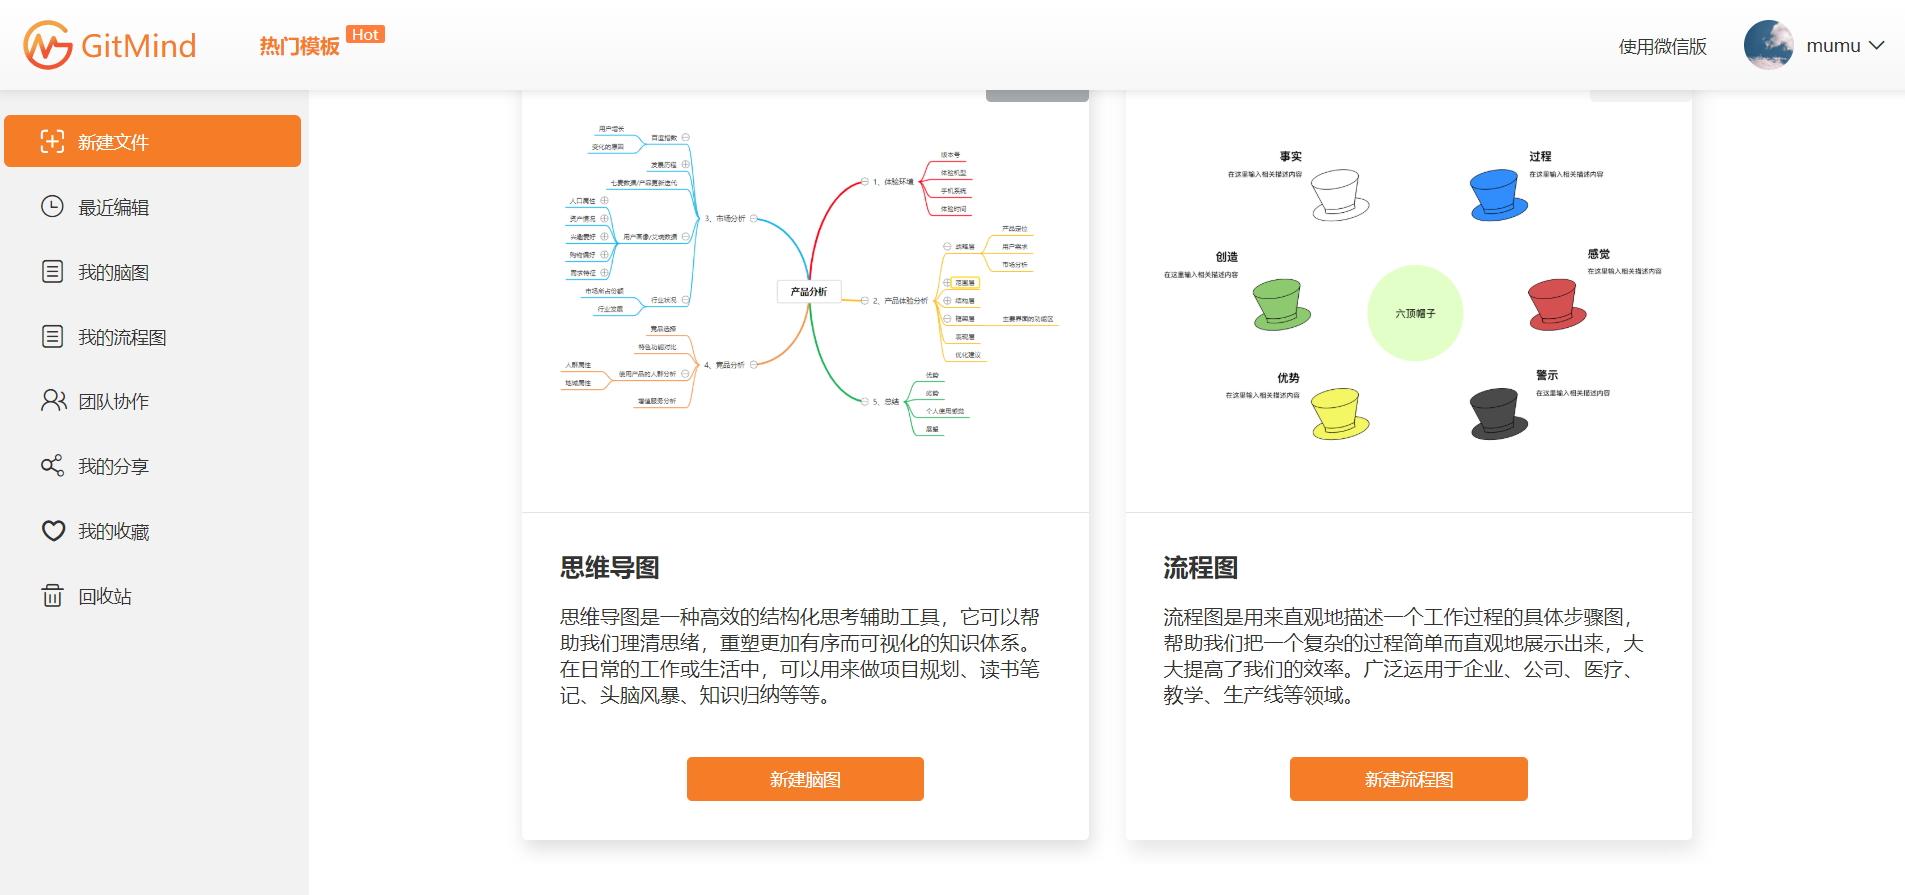 <font color=#EA0000>GitMind:免费在线思维导图、流程图制作软件,多人云协作,海量模板</font>